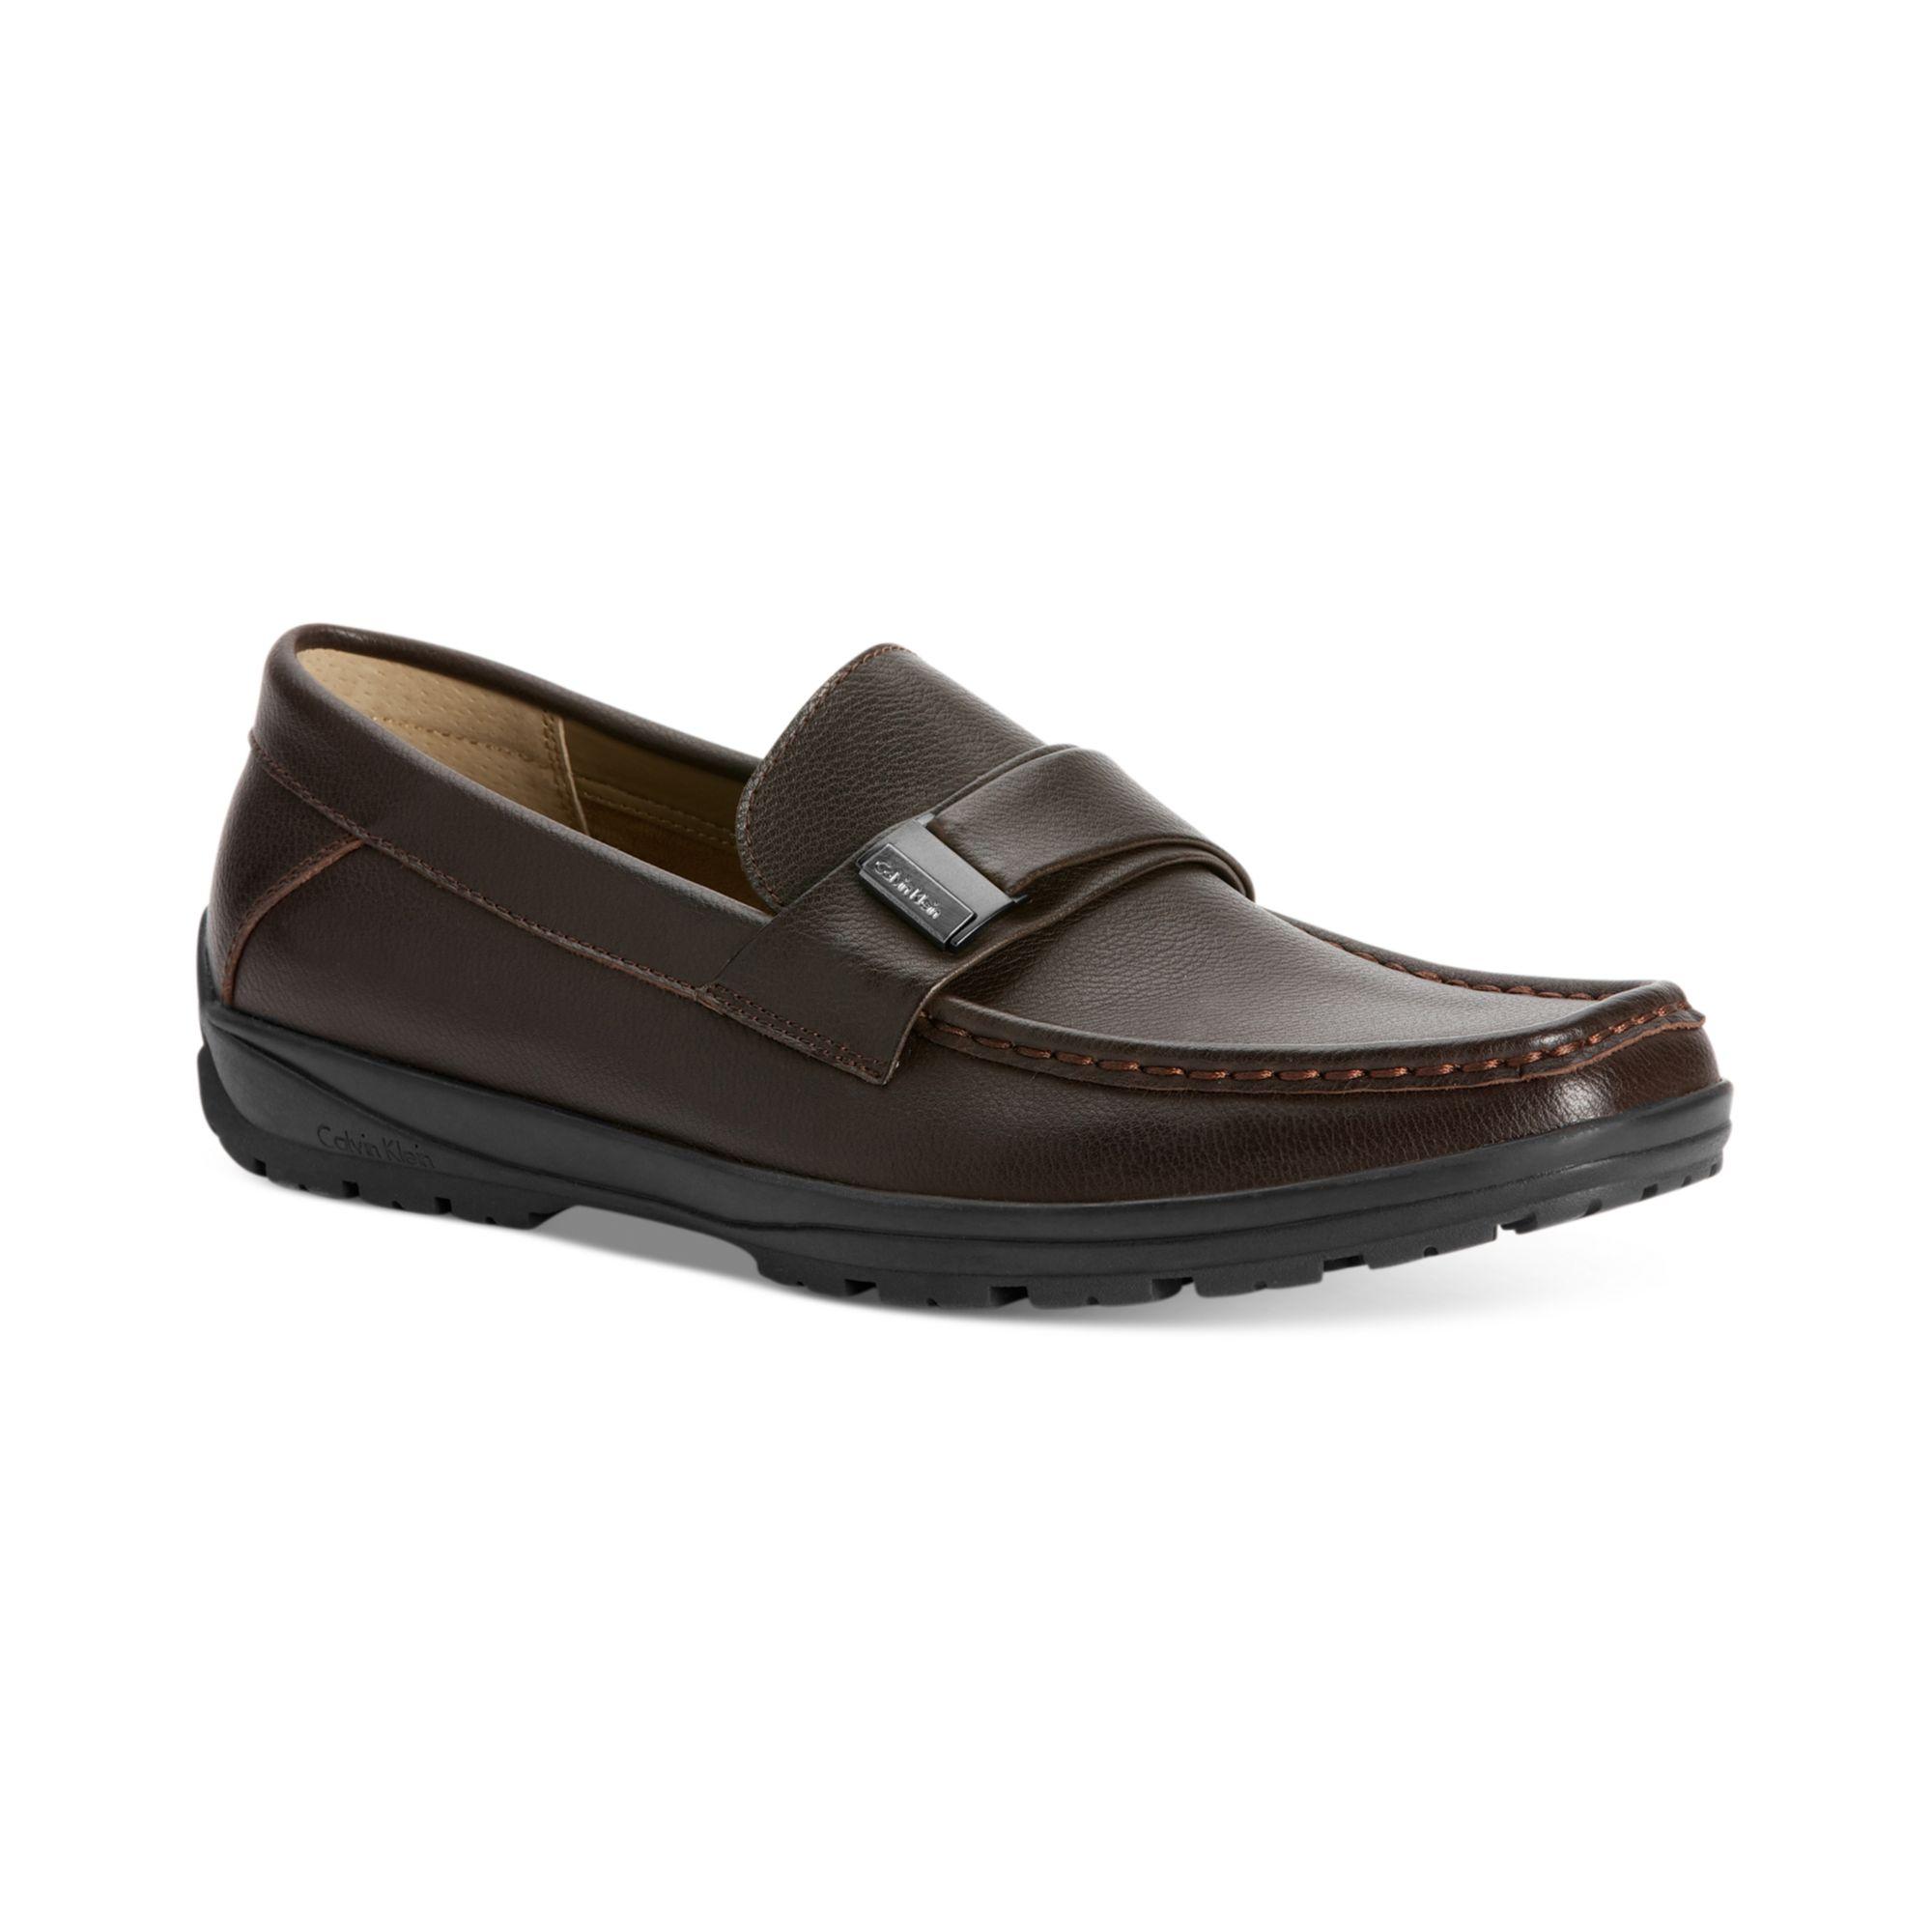 lyst calvin klein quinlan bit slip on shoes in brown for men. Black Bedroom Furniture Sets. Home Design Ideas